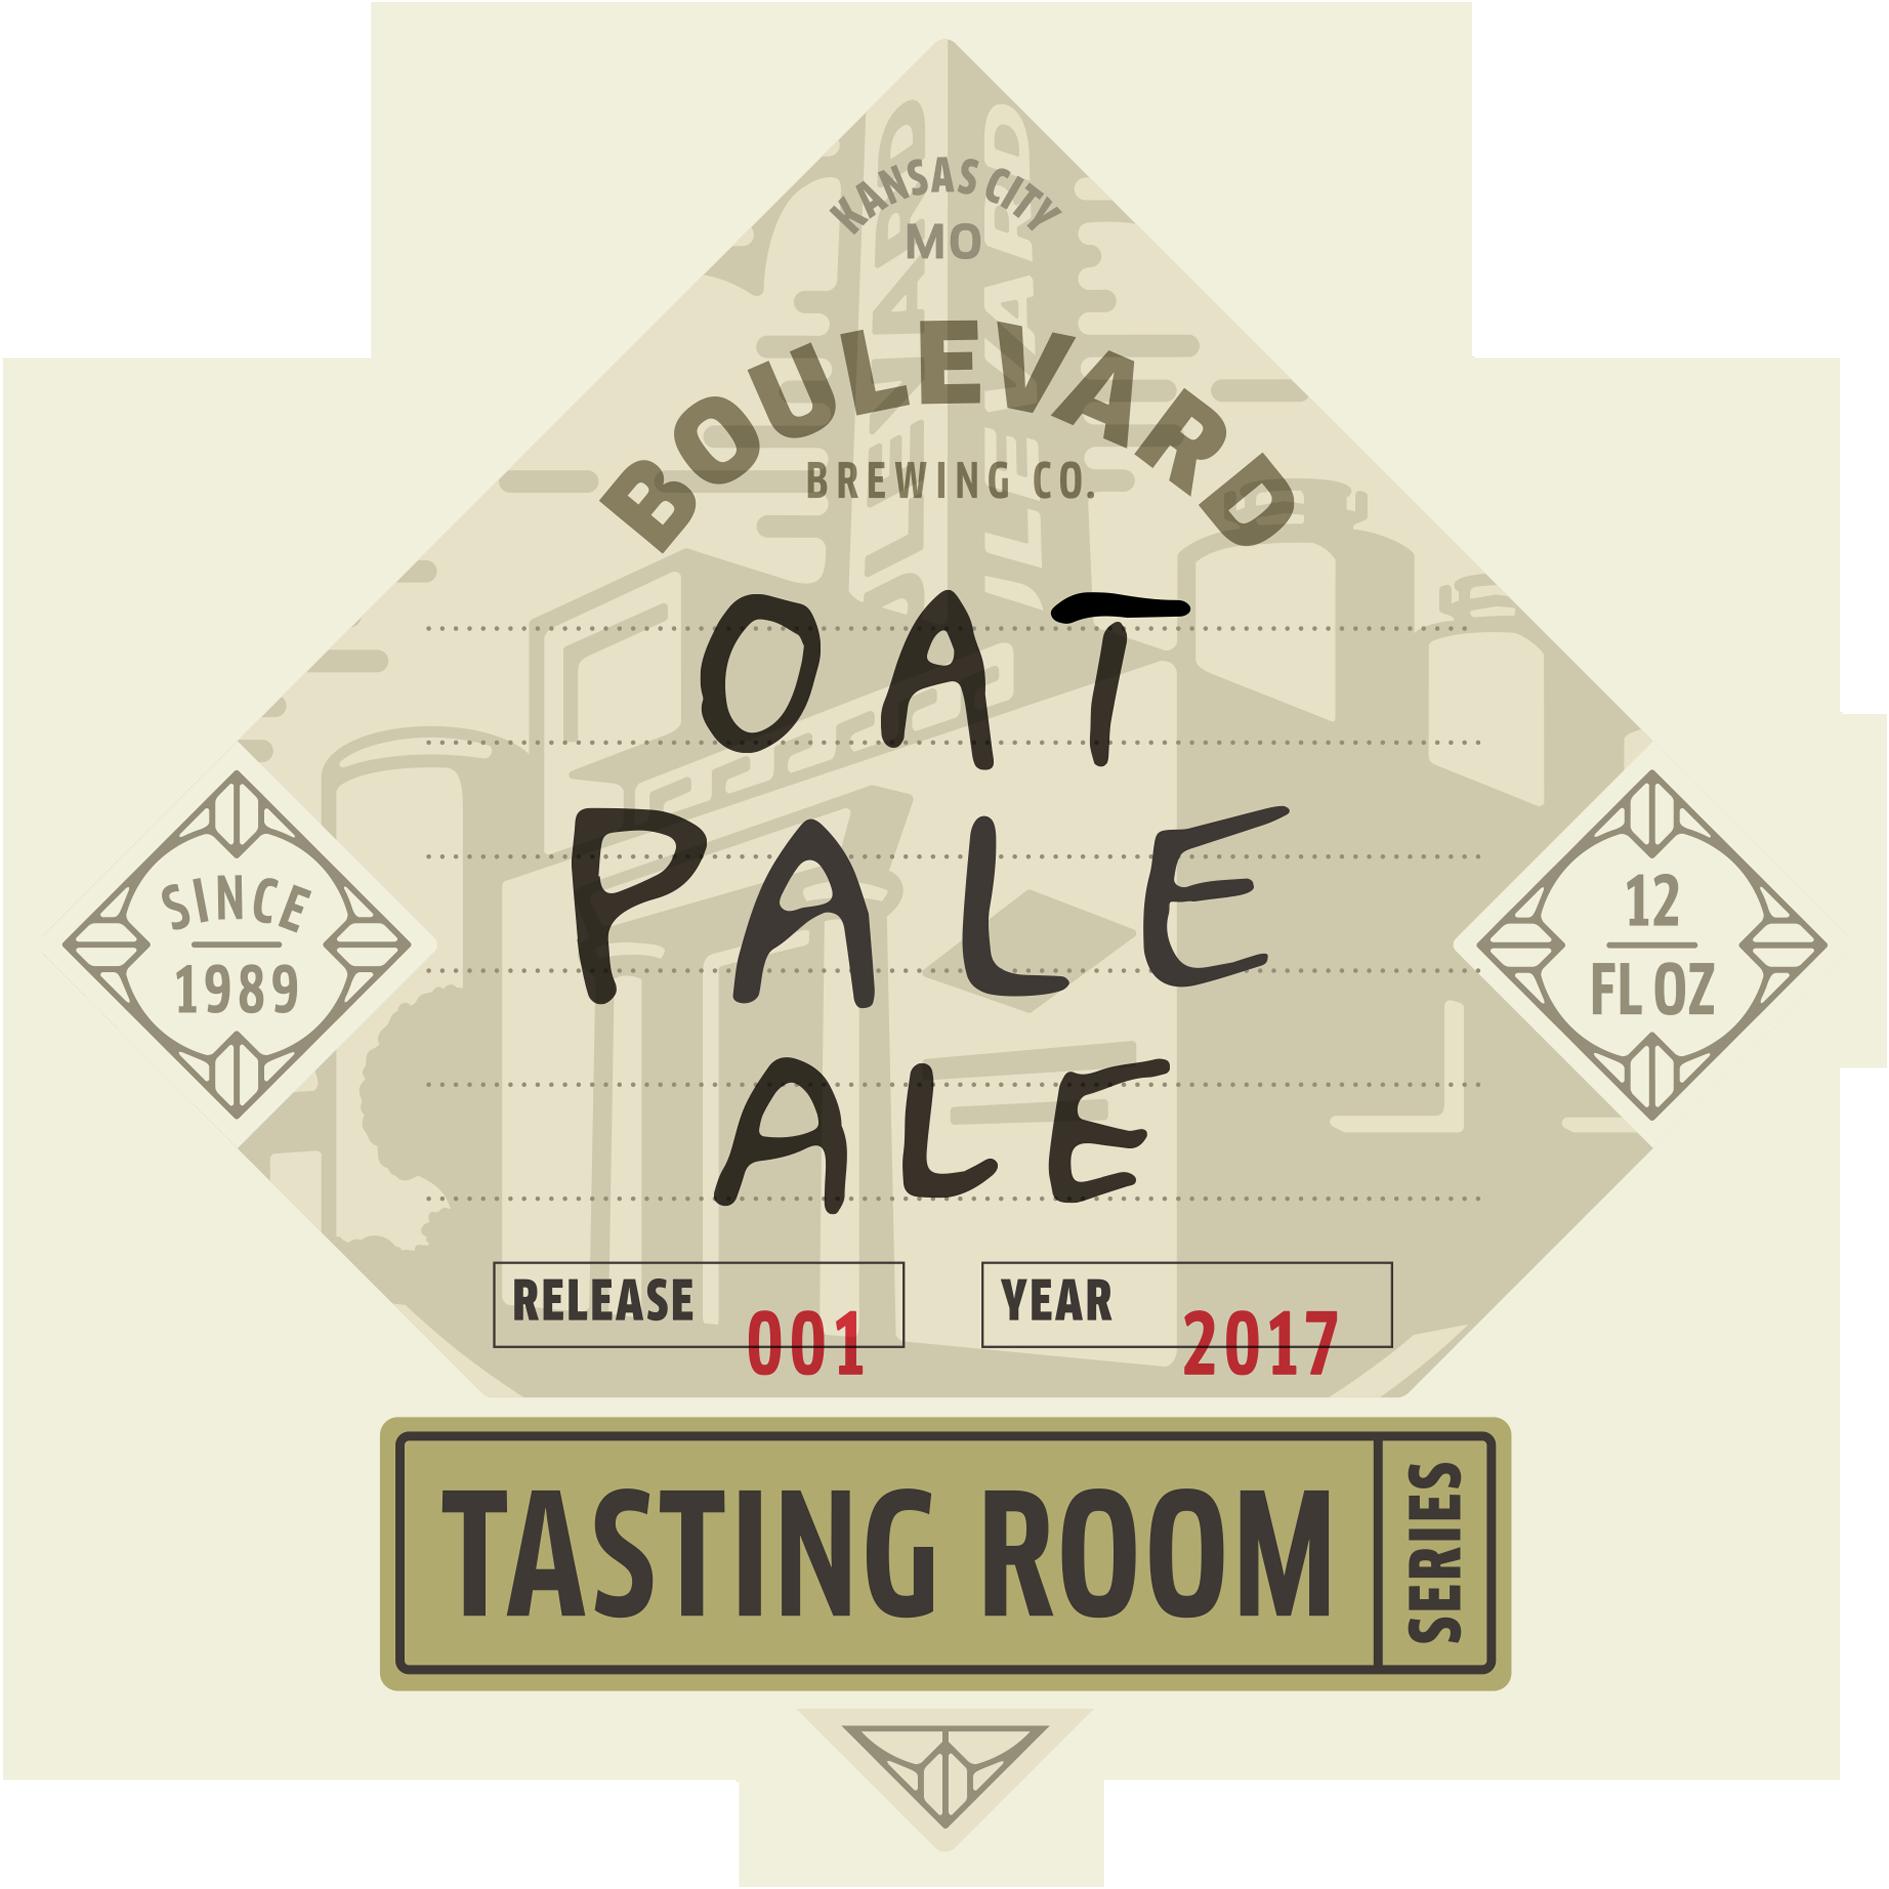 Tasting Room – Oat Pale Ale